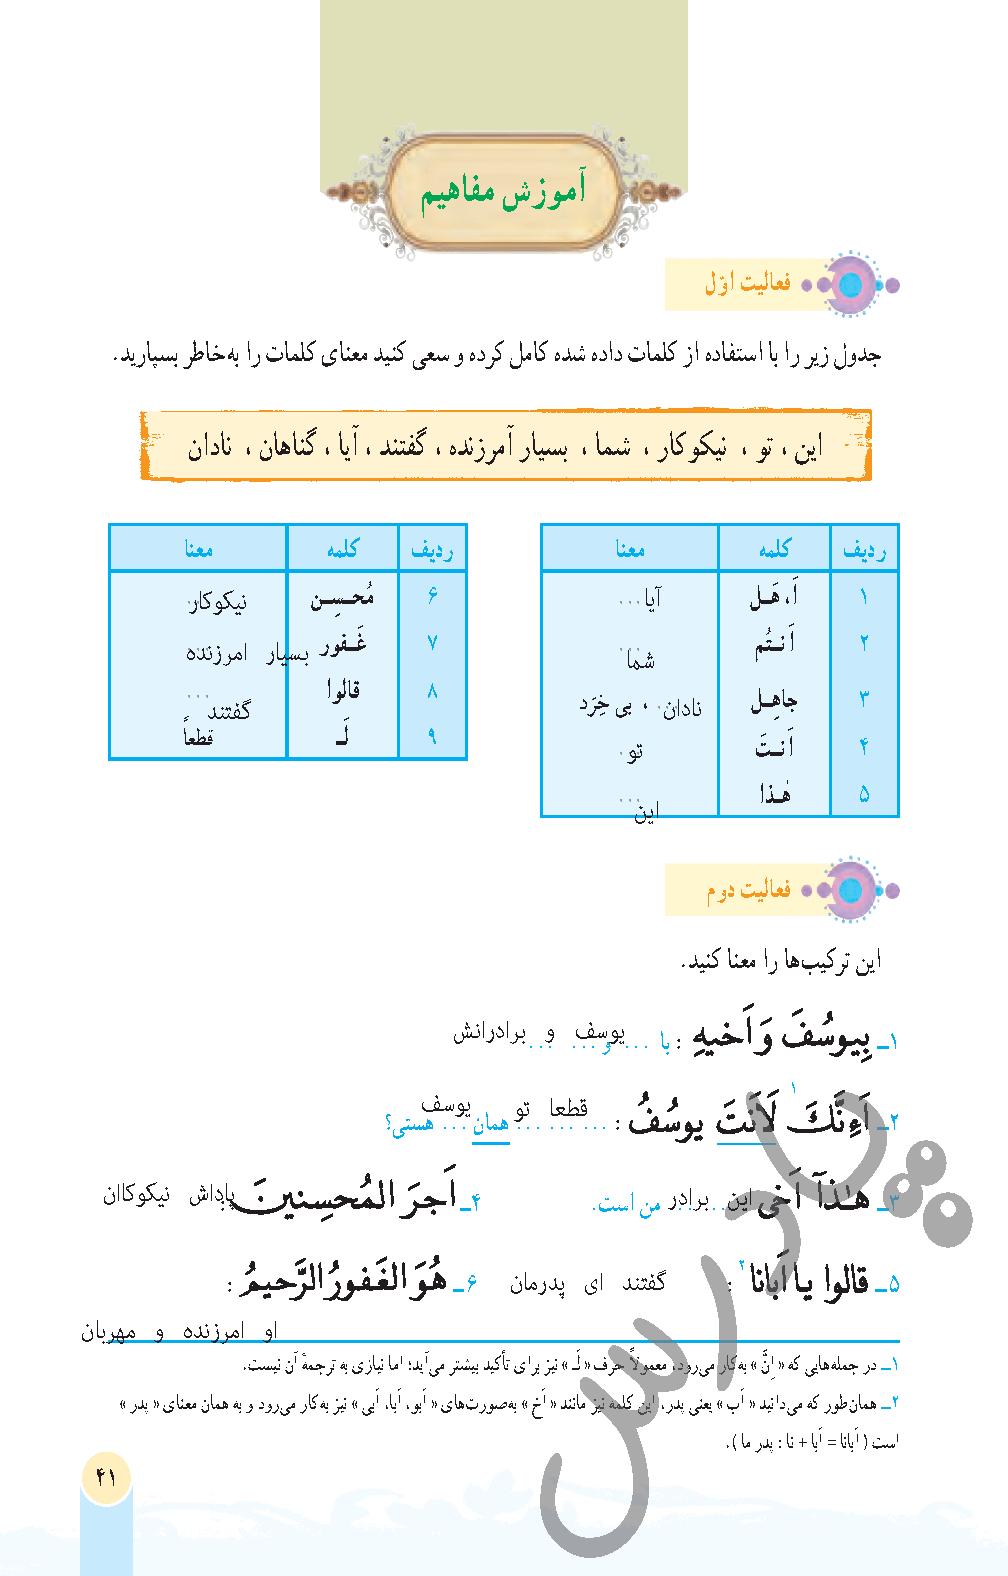 پاسخ فعالیت درس 4 قرآن هفتم- جلسه  اول